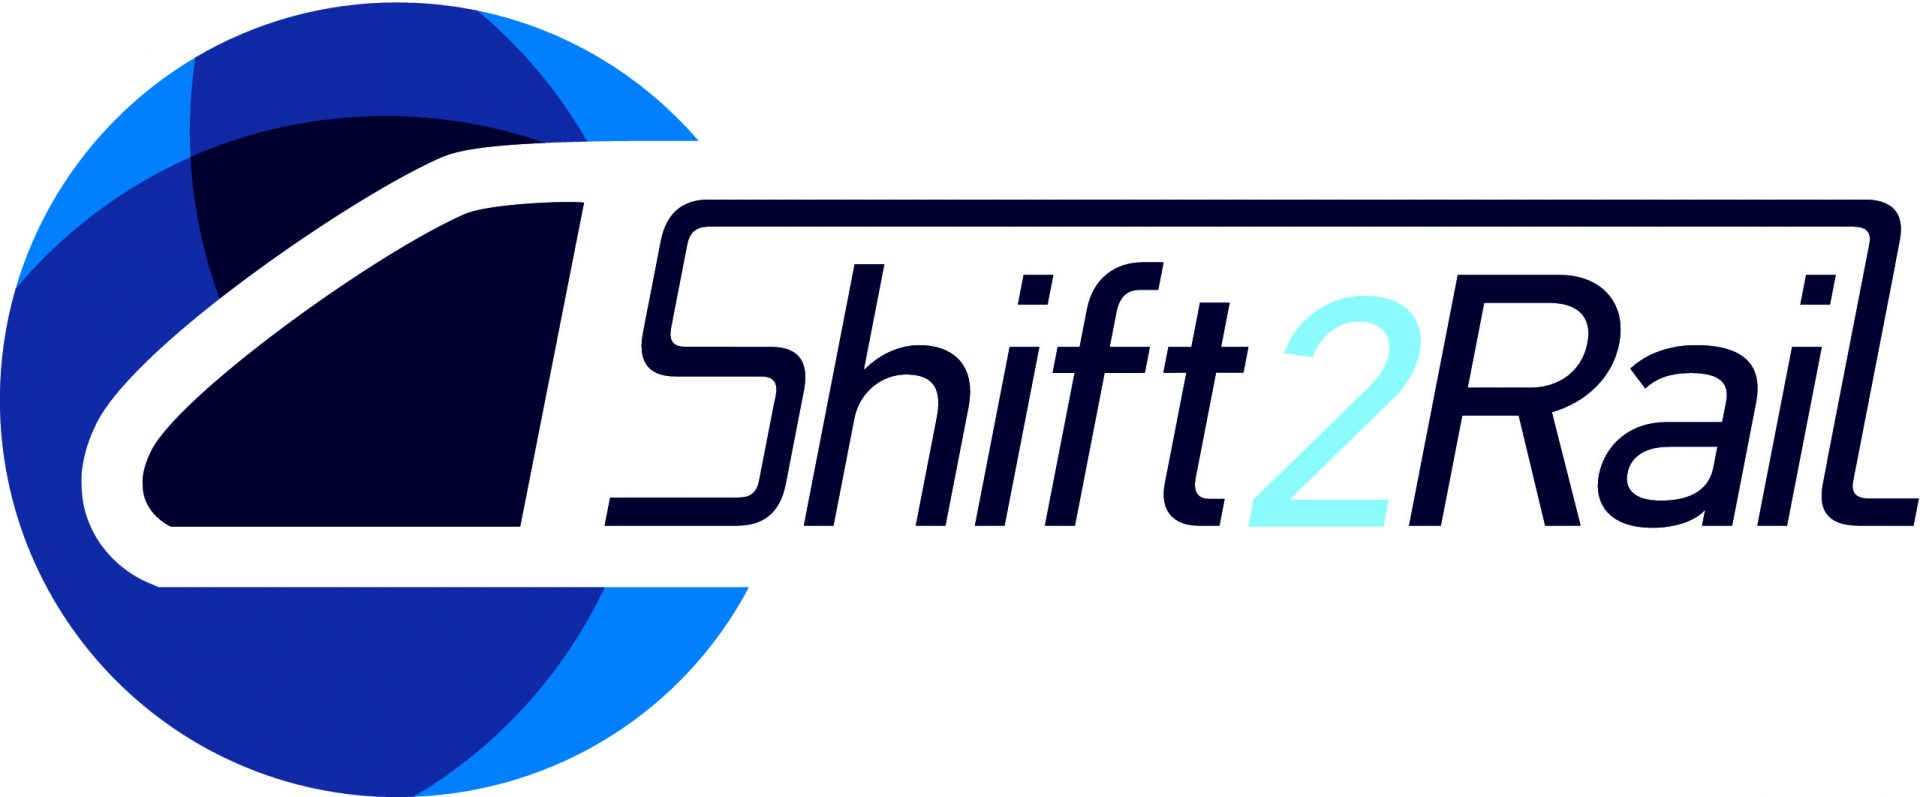 Imagen del proyecto Shift2Rail